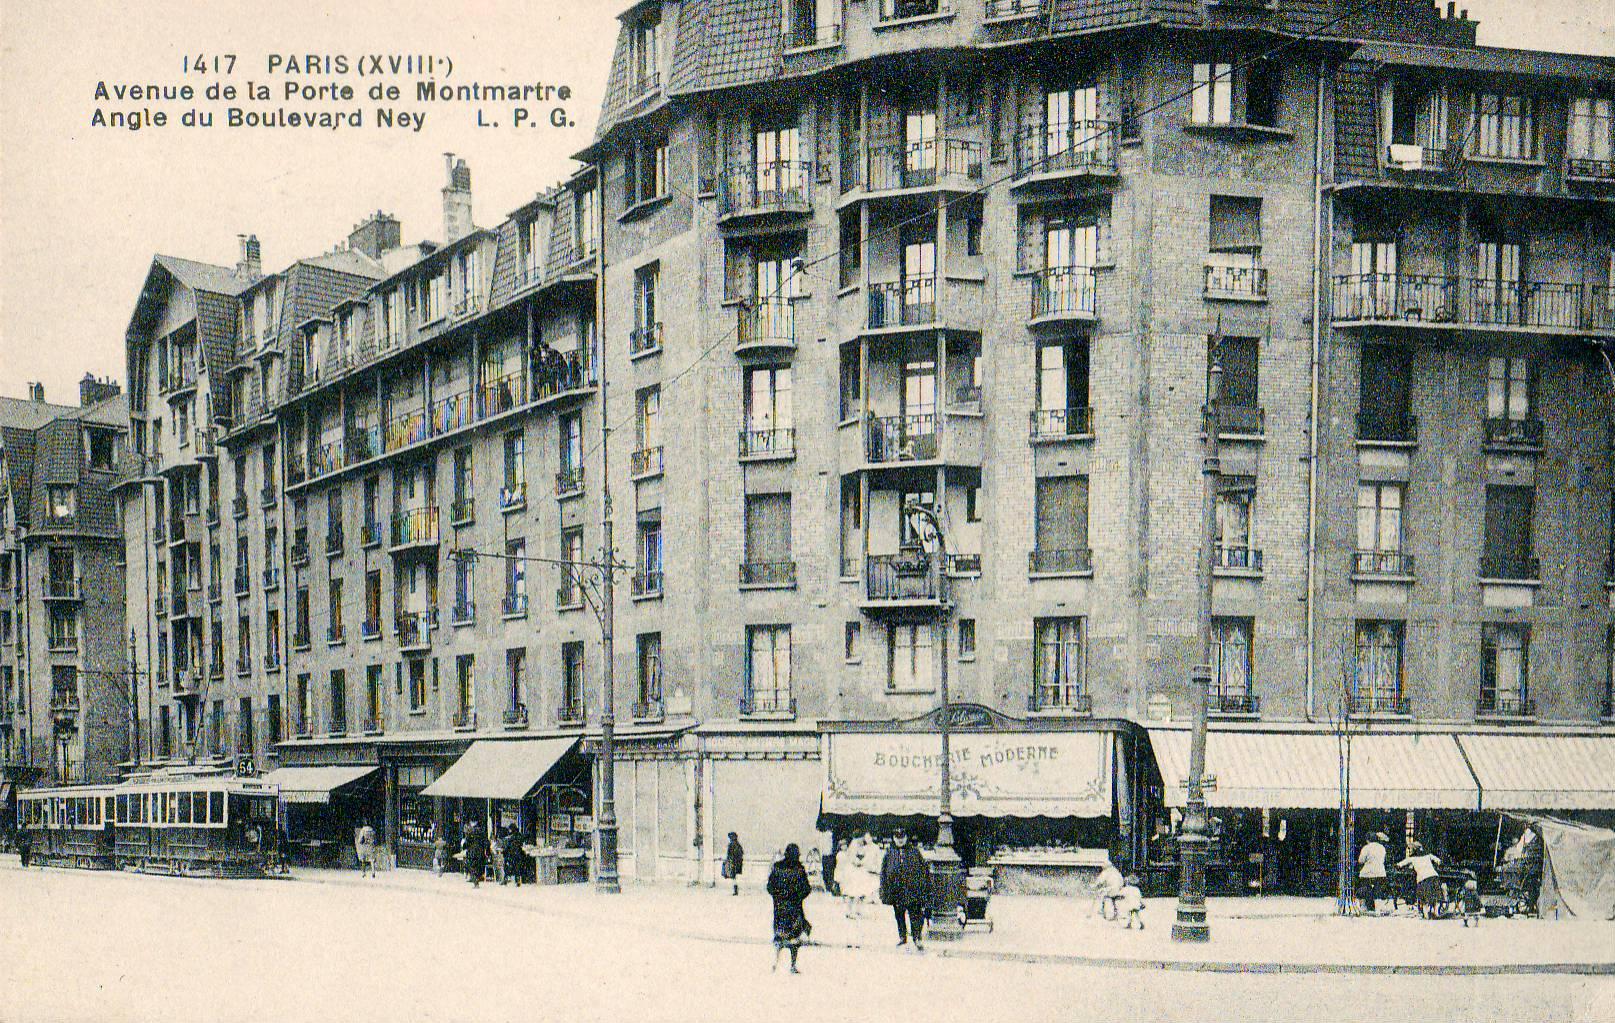 http://upload.wikimedia.org/wikipedia/commons/e/e1/LPG_1417_-_PARIS_(XVIII)_-_Avenue_de_la_Porte_de_Montmartre_-_Angle_du_Boulevard_Ney.JPG